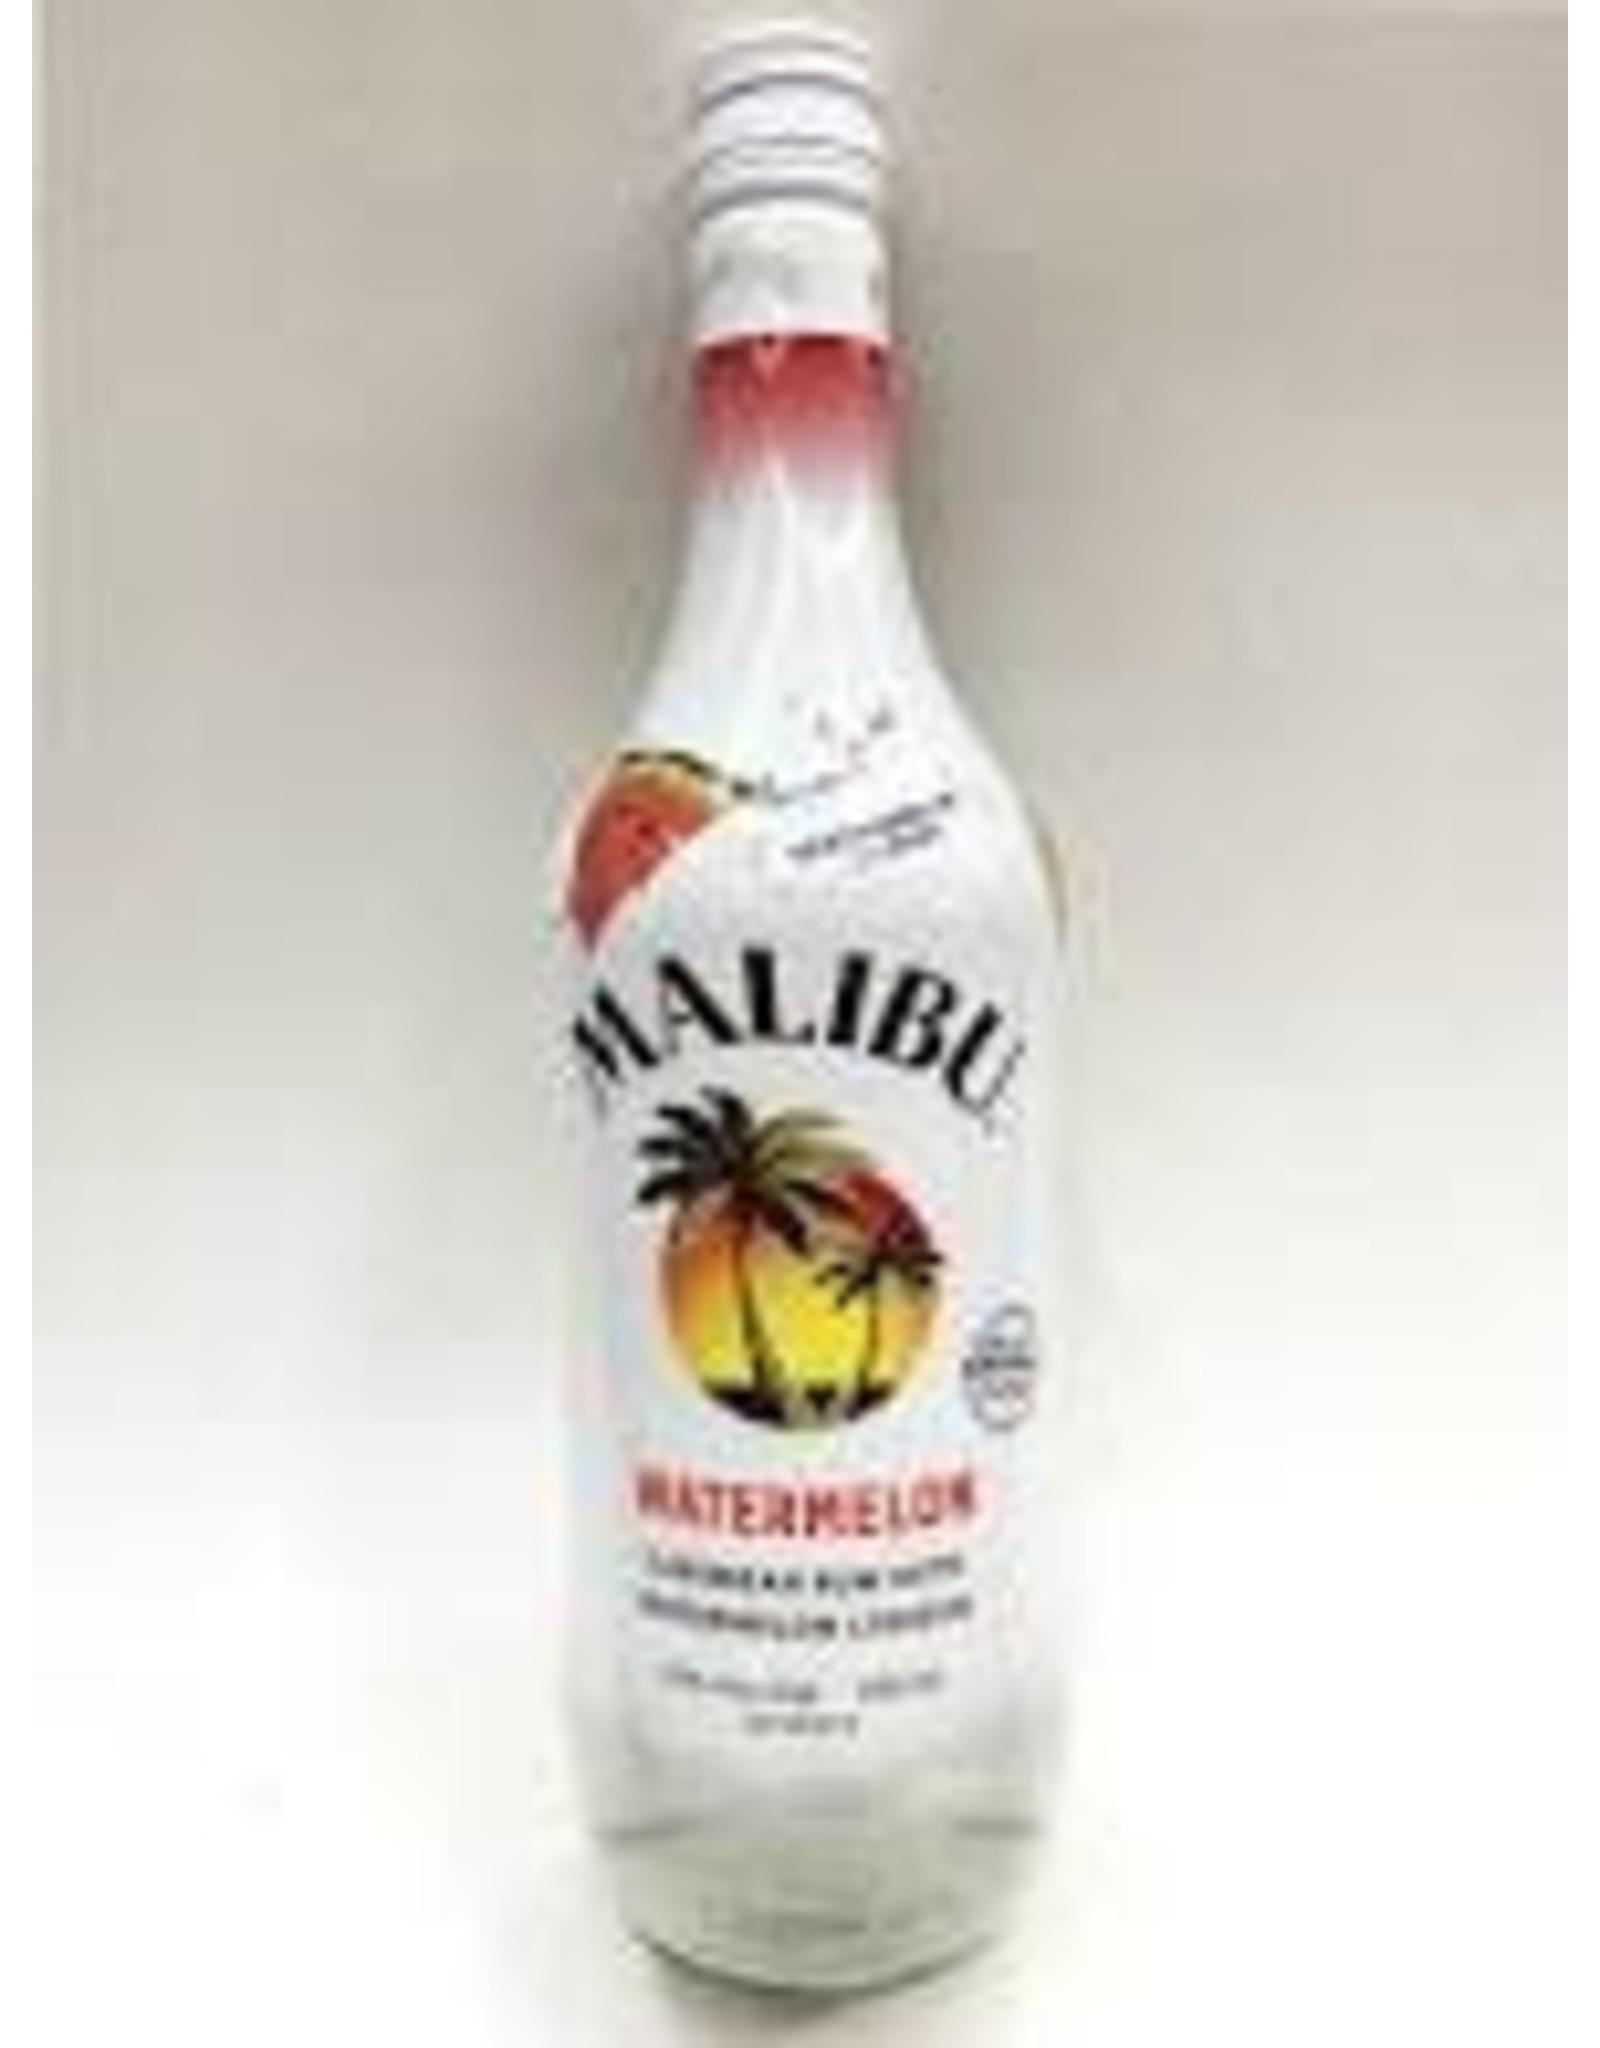 MALIBU WATERMELON 750ML